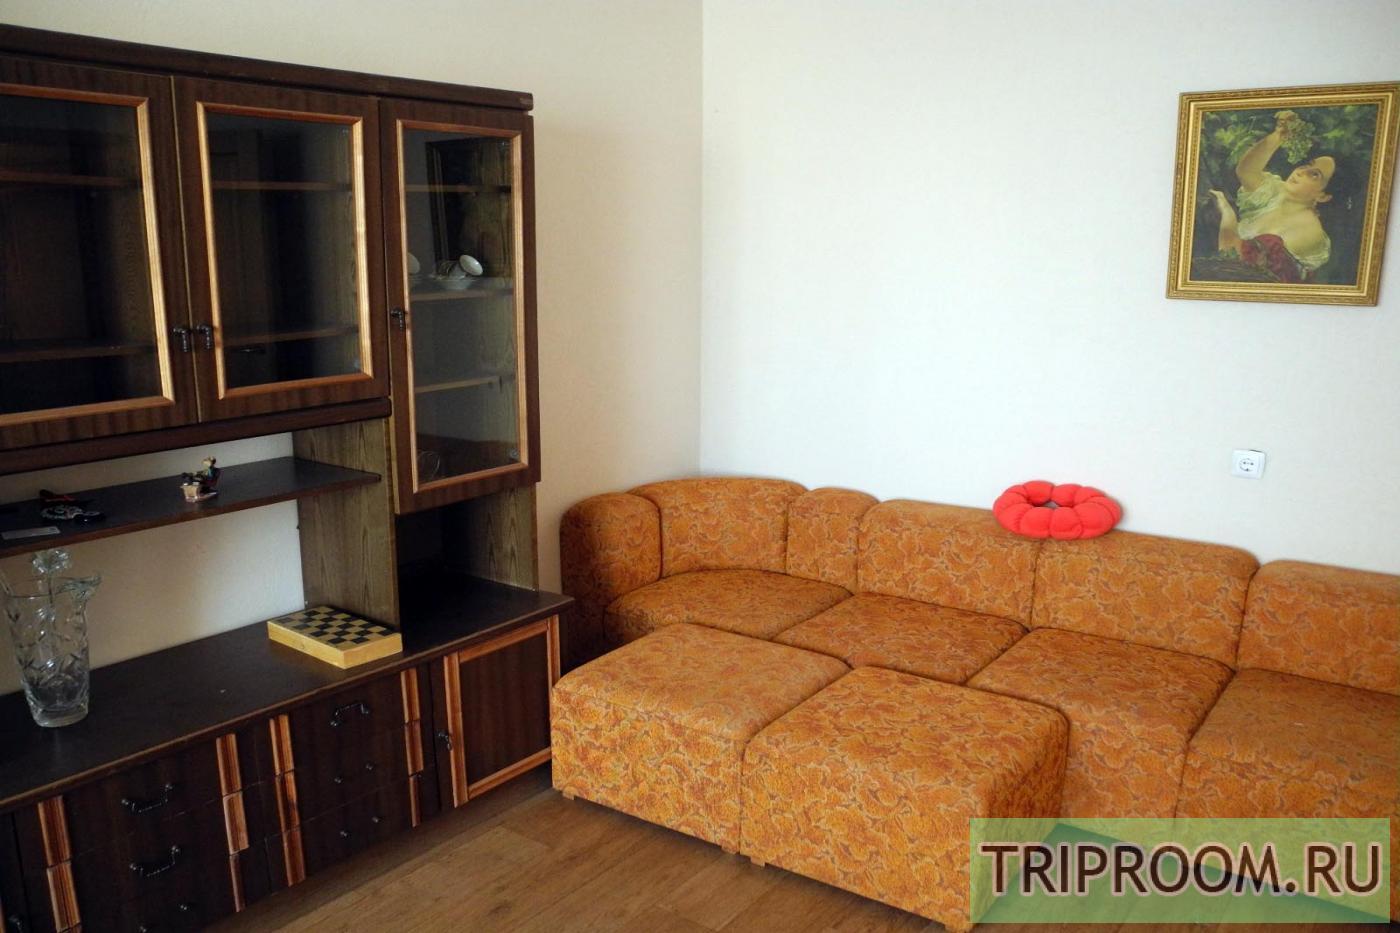 2-комнатная квартира посуточно (вариант № 3868), ул. Кропоткина улица, фото № 4